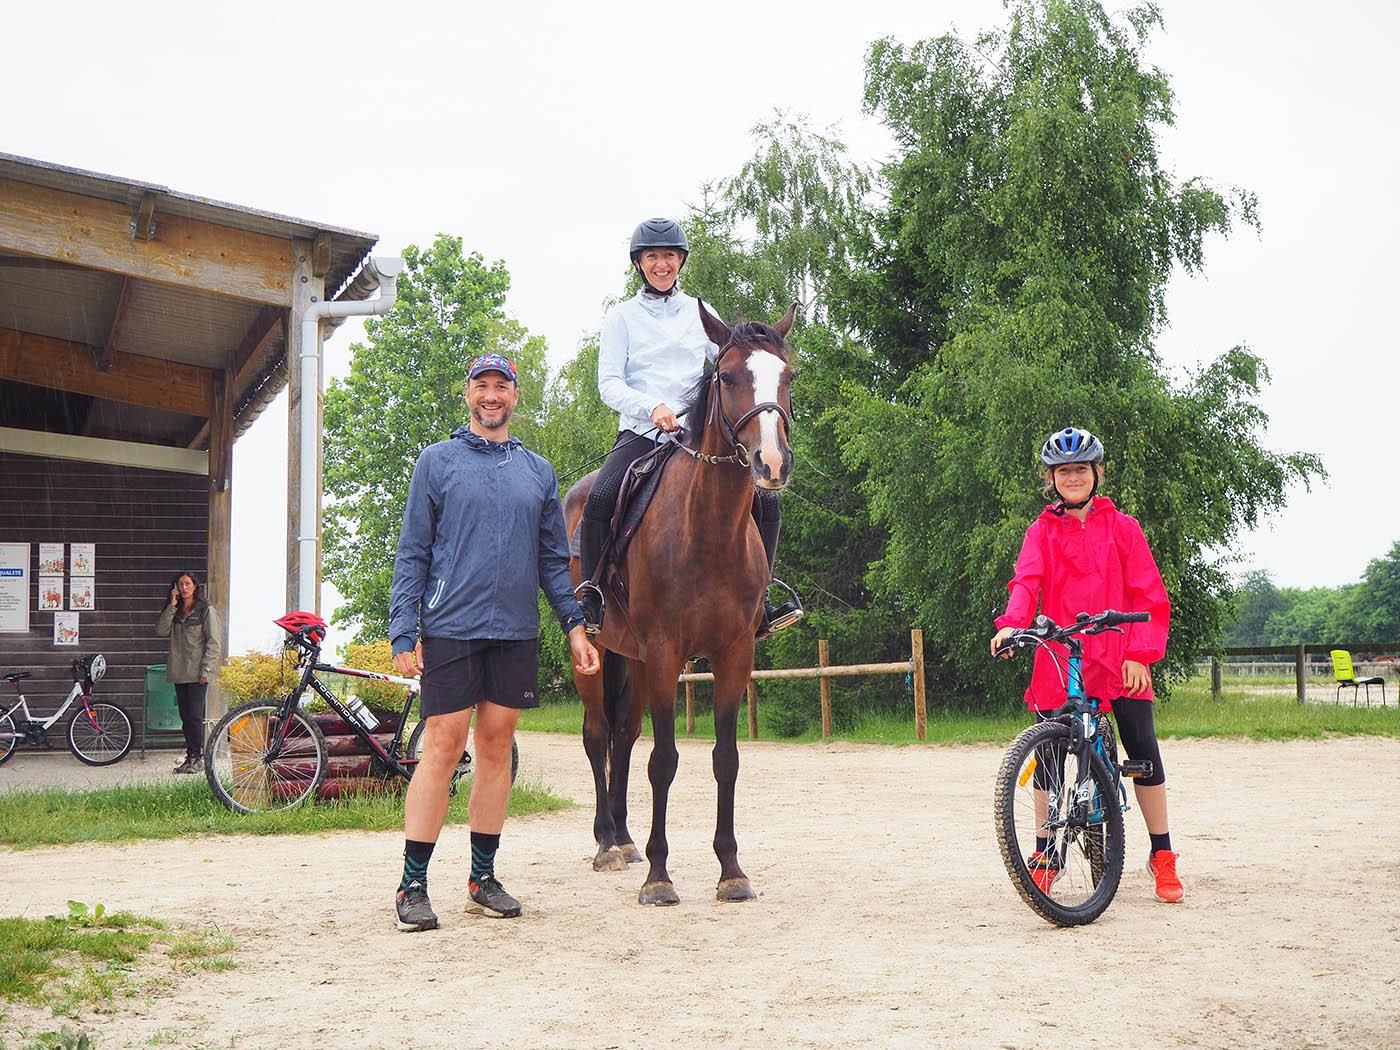 Fête du Club et Ride, bike and run